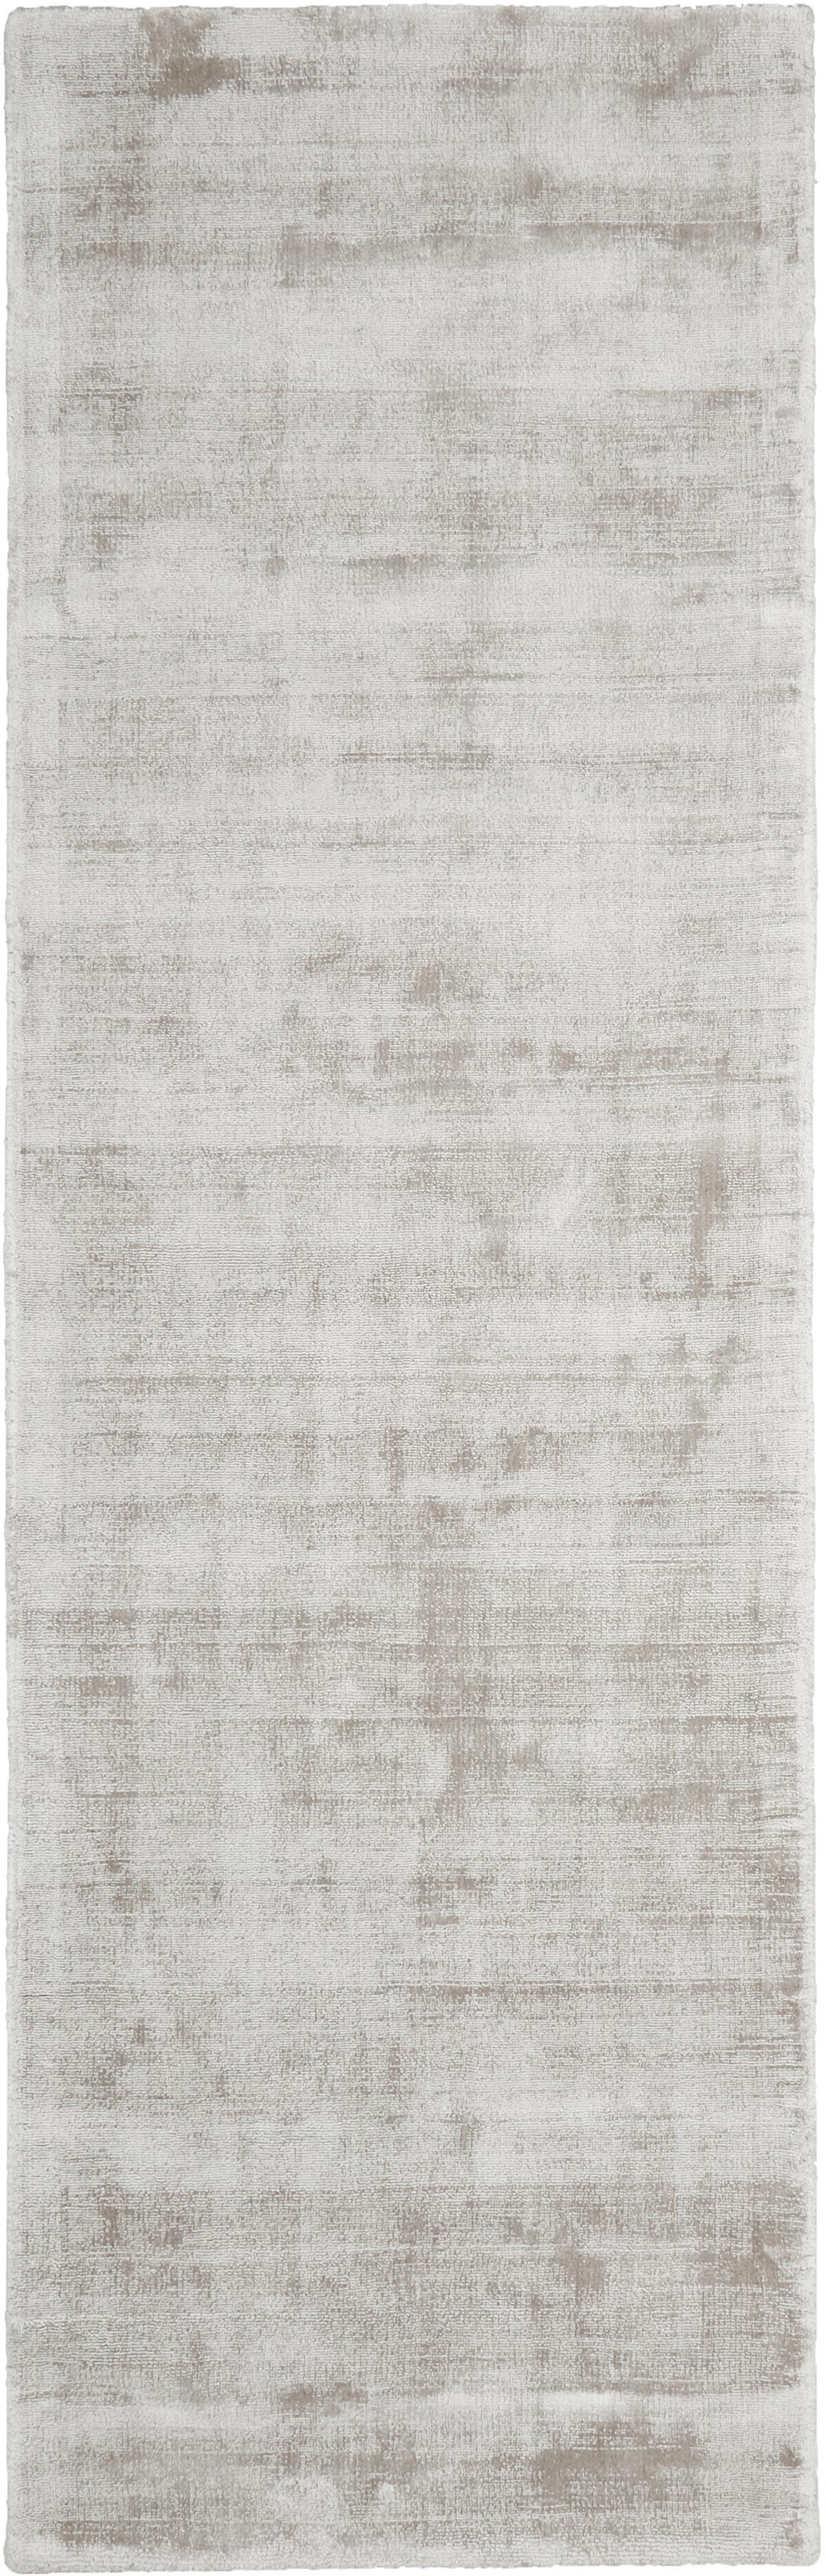 Passatoia in viscosa tessuta a mano Jane, Retro: 100% cotone, Grigio chiaro-beige, Larg. 80 x Lung. 250 cm